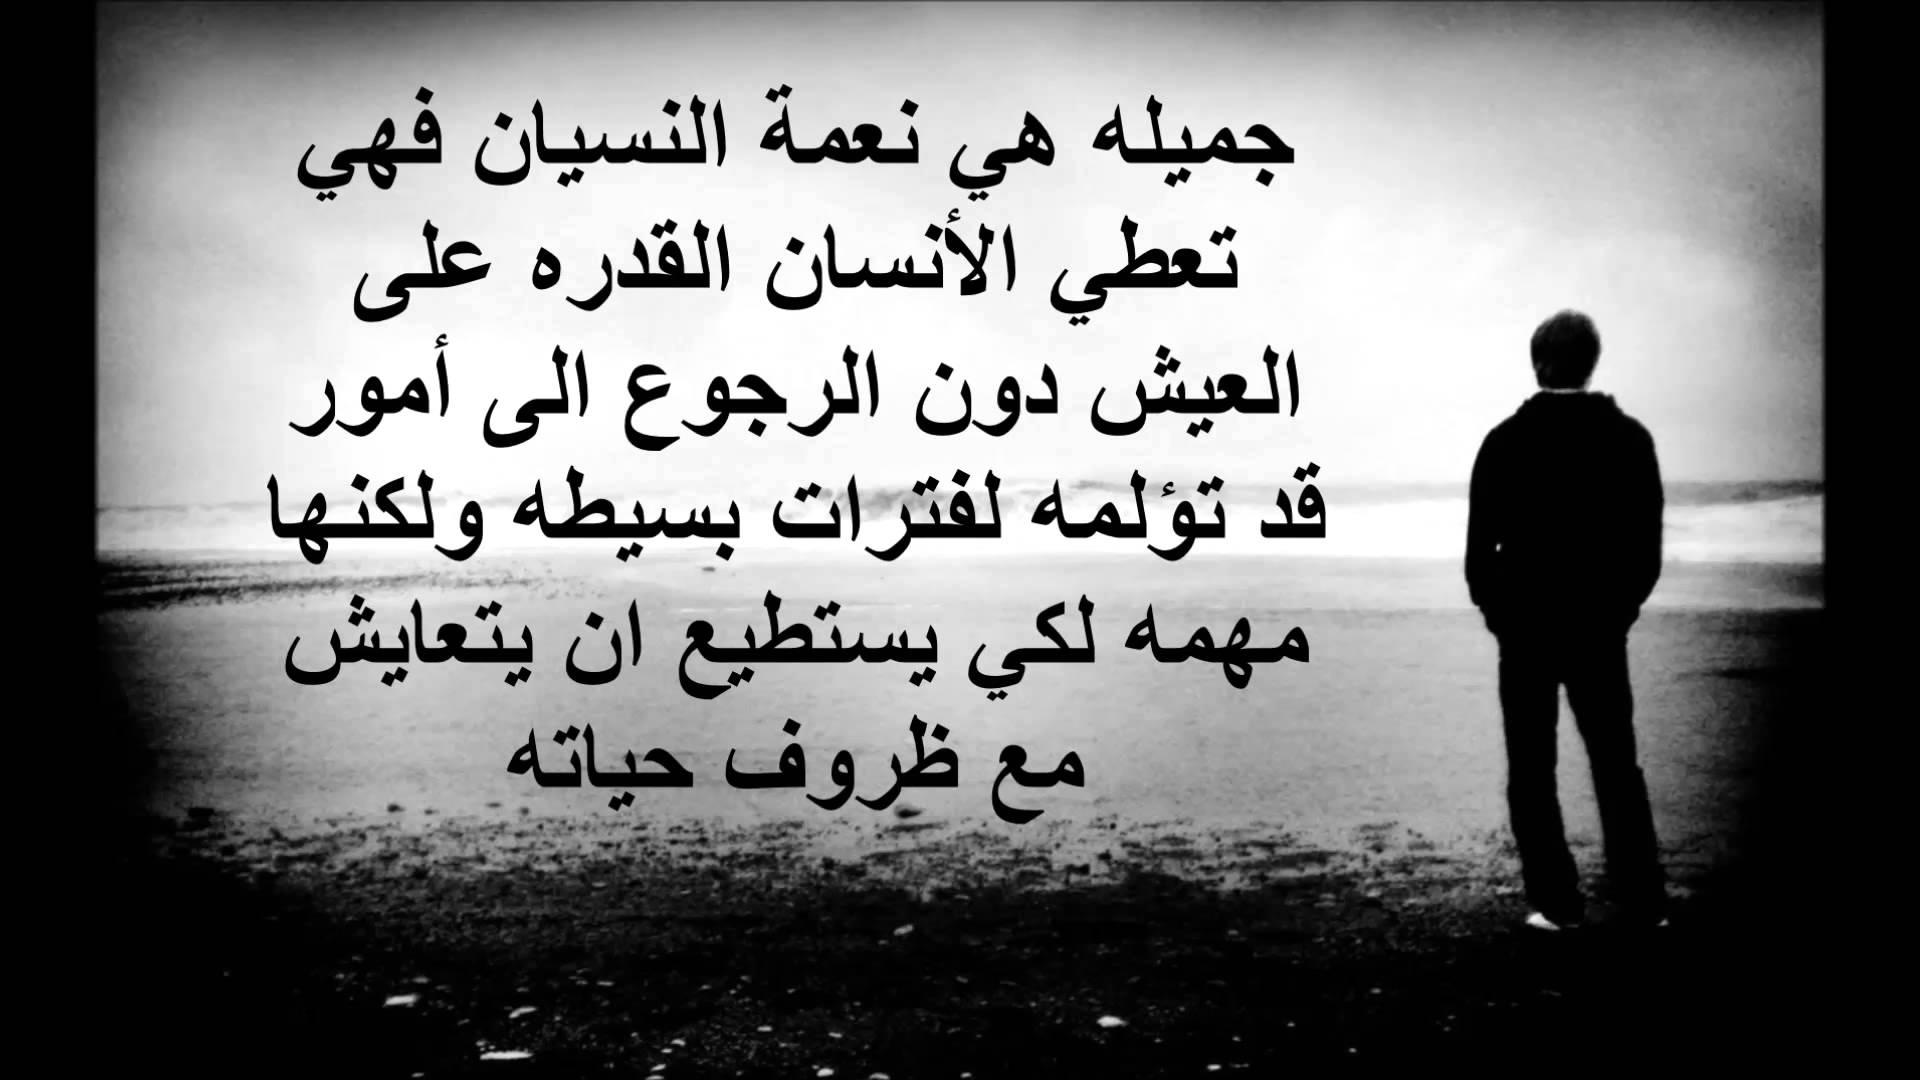 بالصور صور حزن وفراق , صور معبره عن الالم والحزن 4457 5